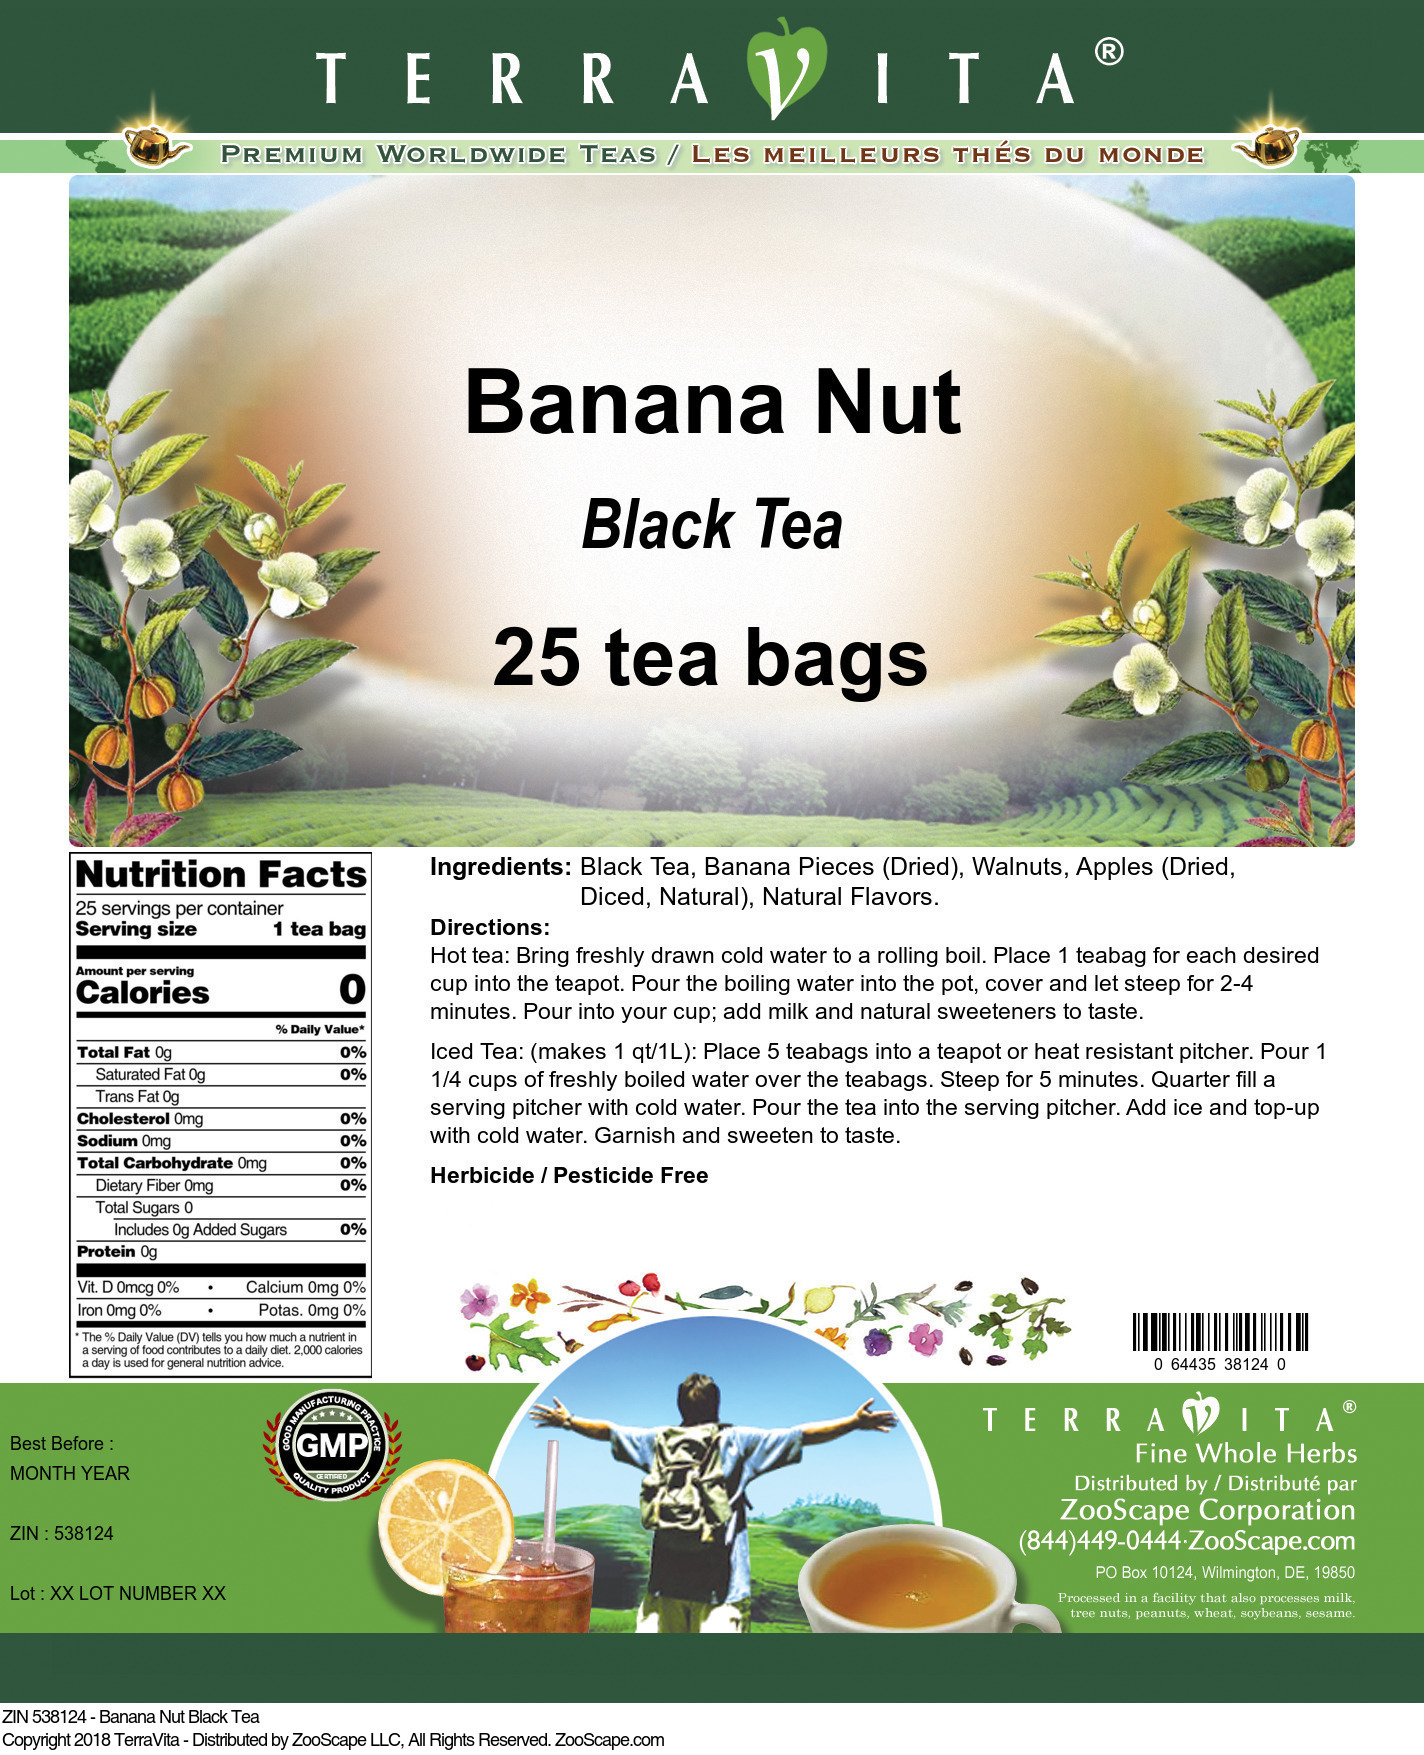 Banana Nut Black Tea